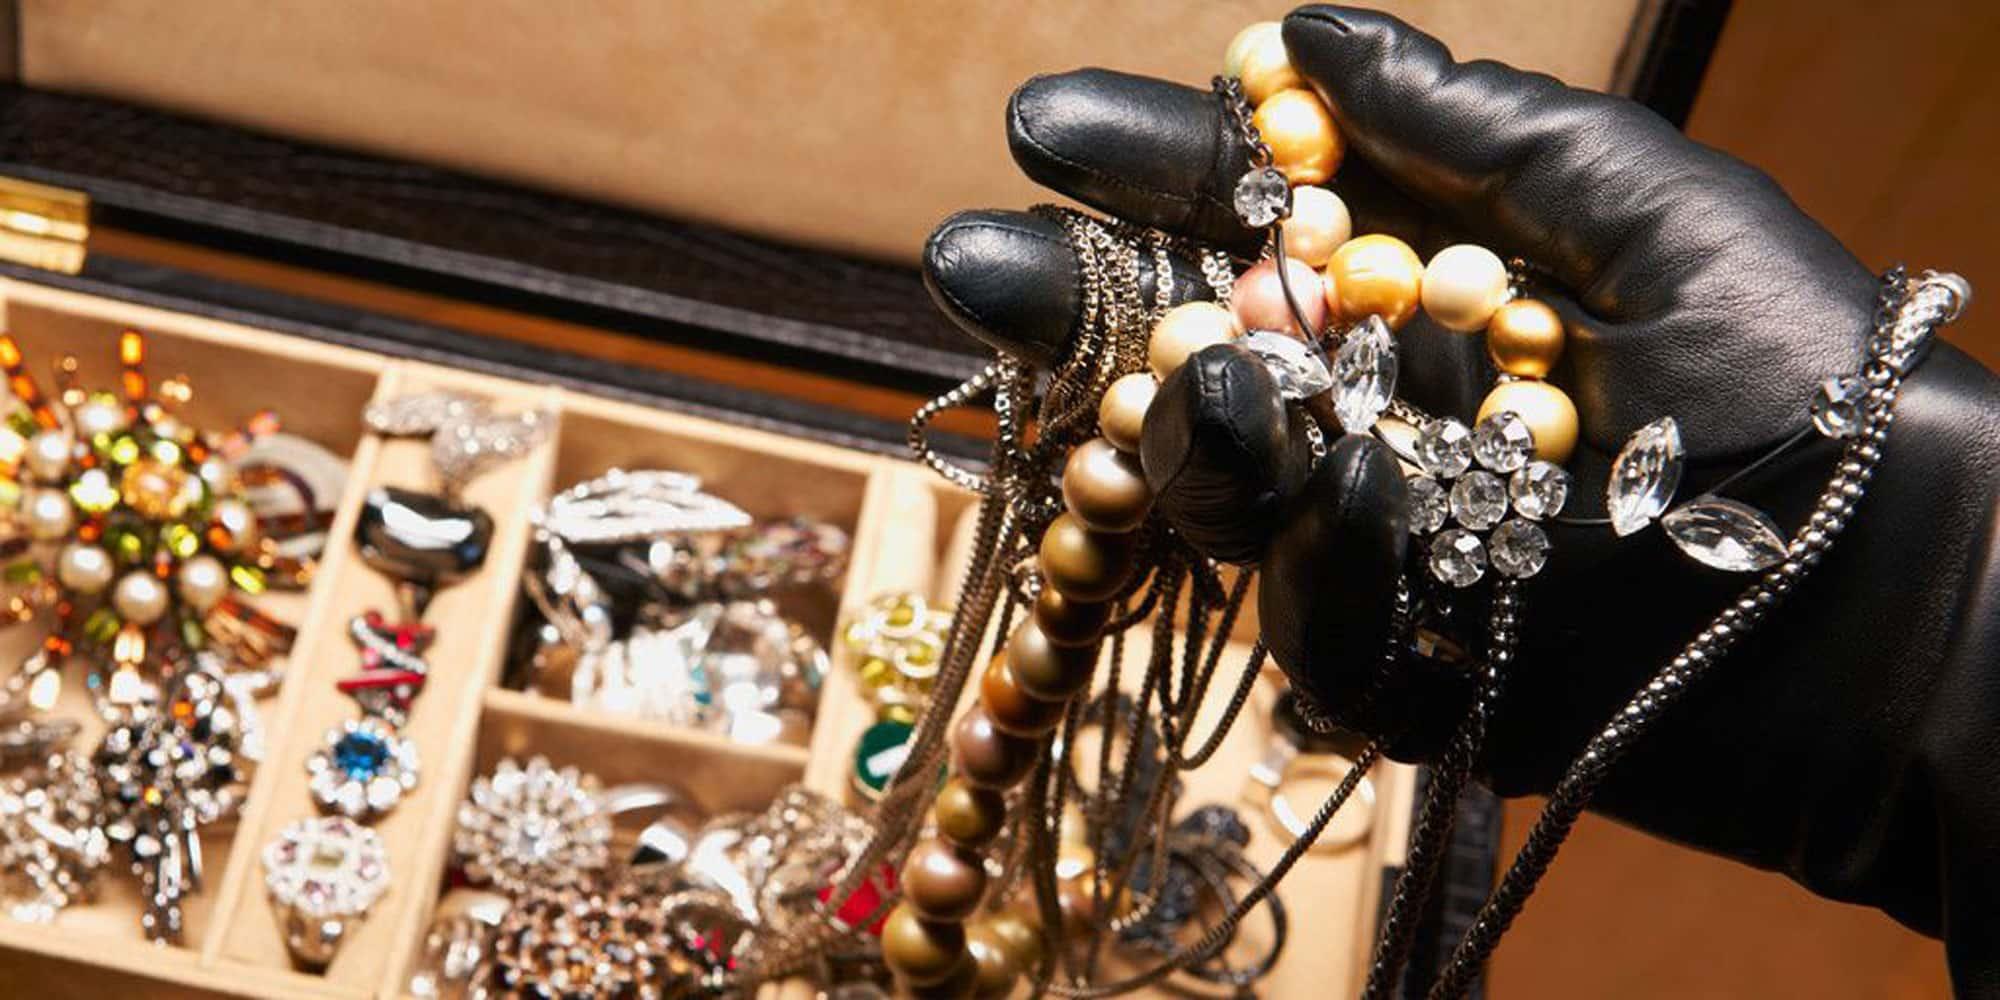 thief stealing jewelry